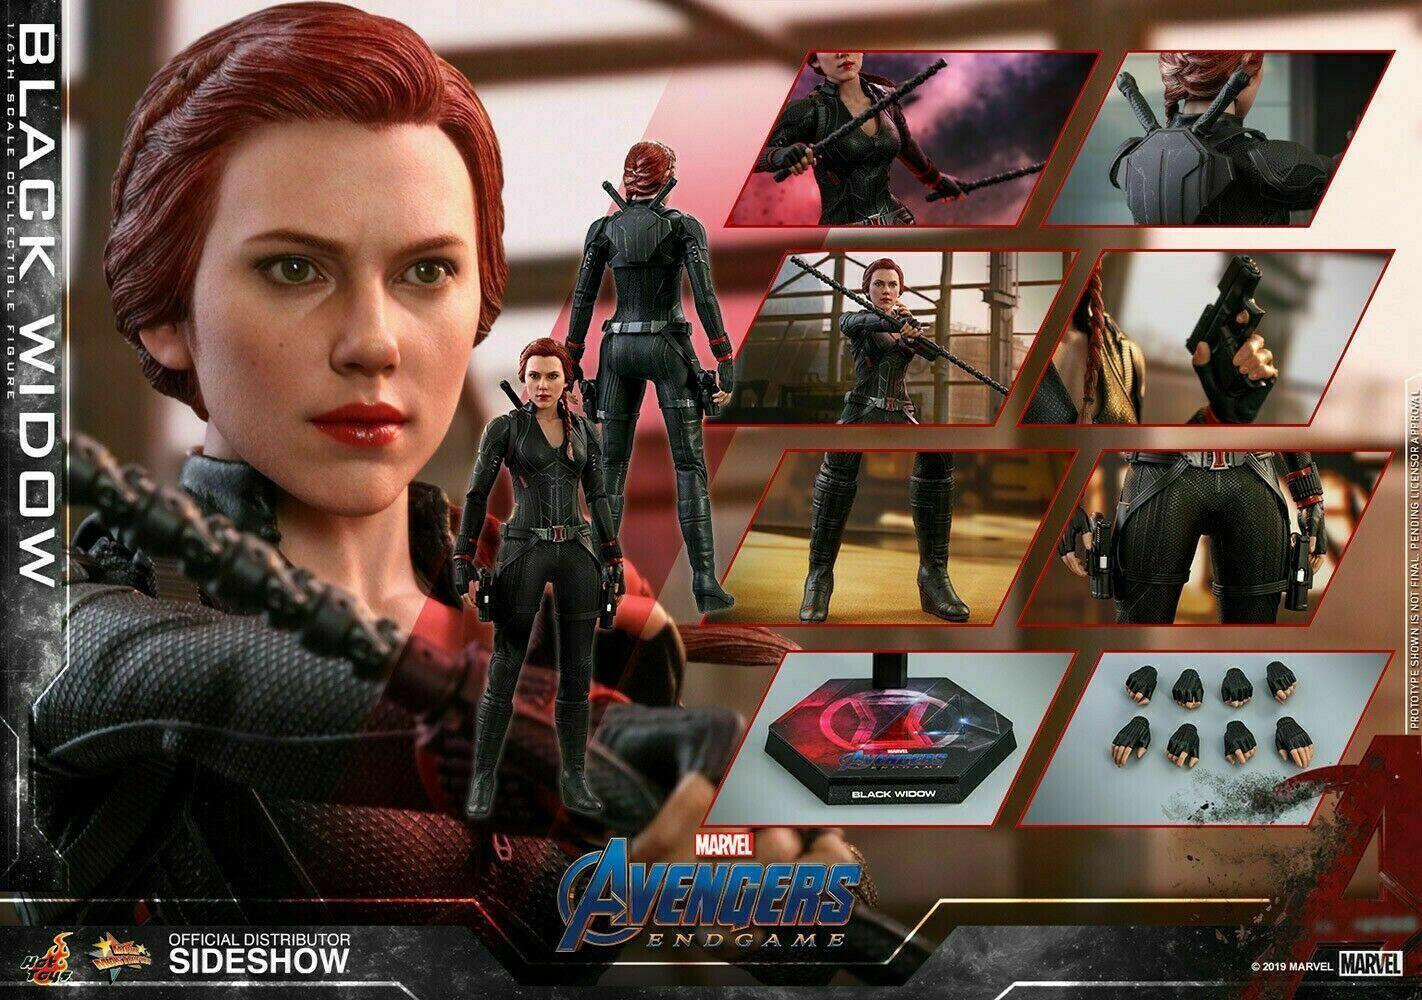 Hot Toys Marvel Avengers Endgame BLACK WIDOW 1/6th Figure (MMS533)  on eBay thumbnail